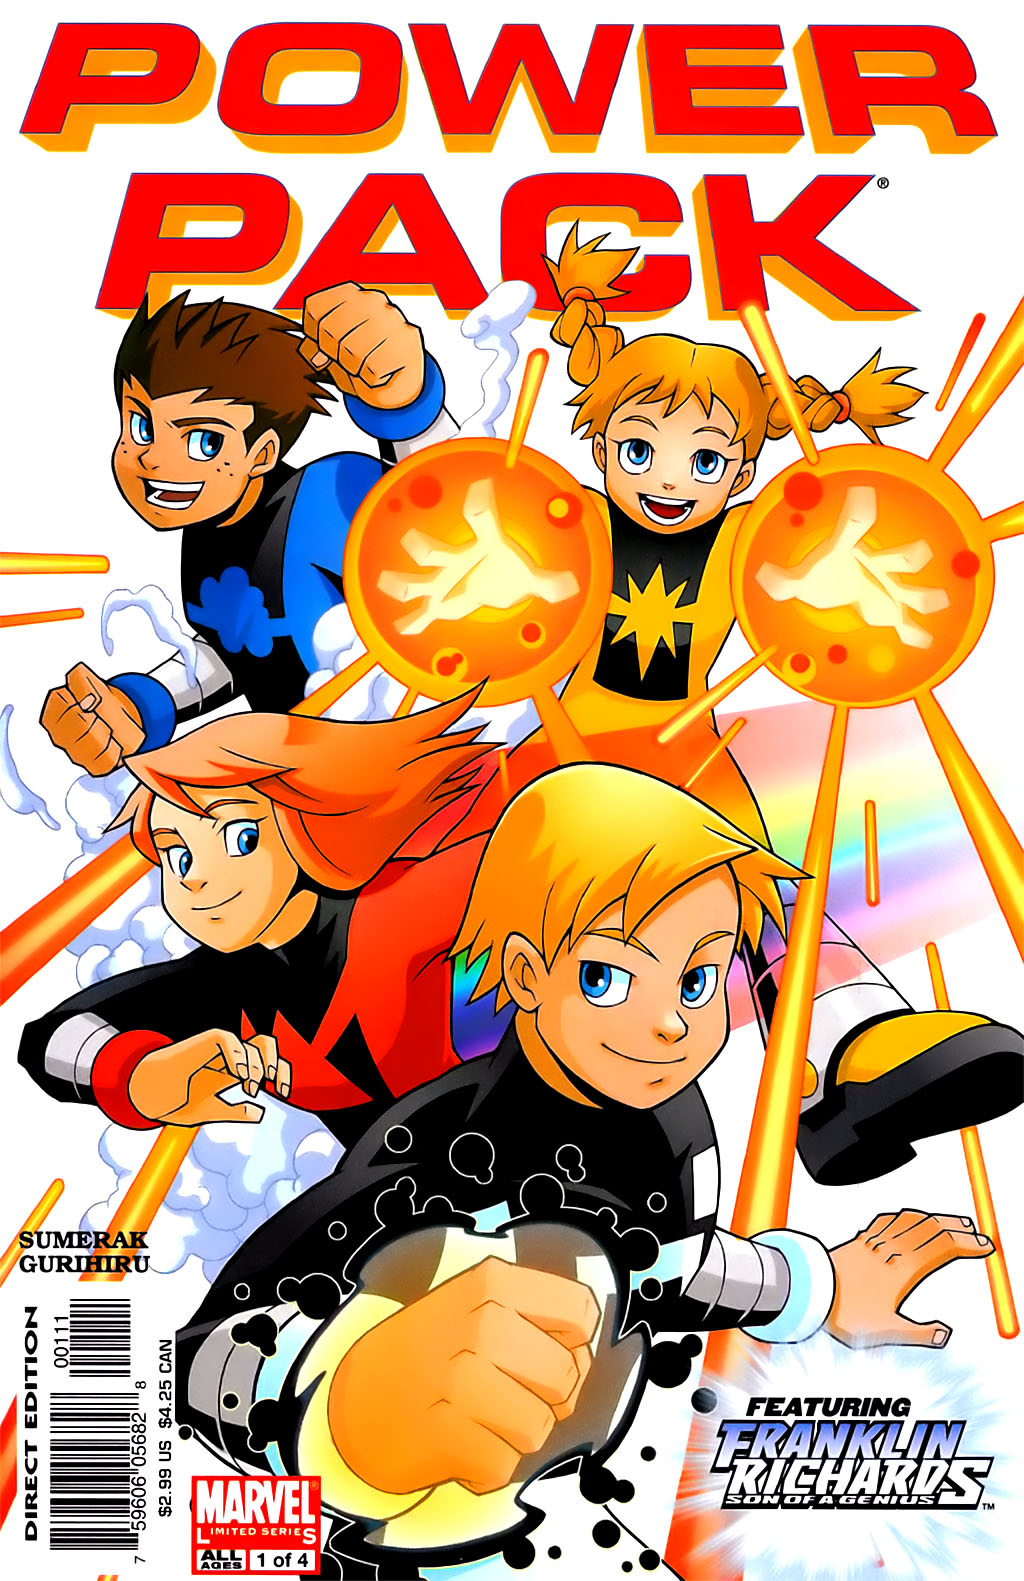 Power Pack vol. 3 #1